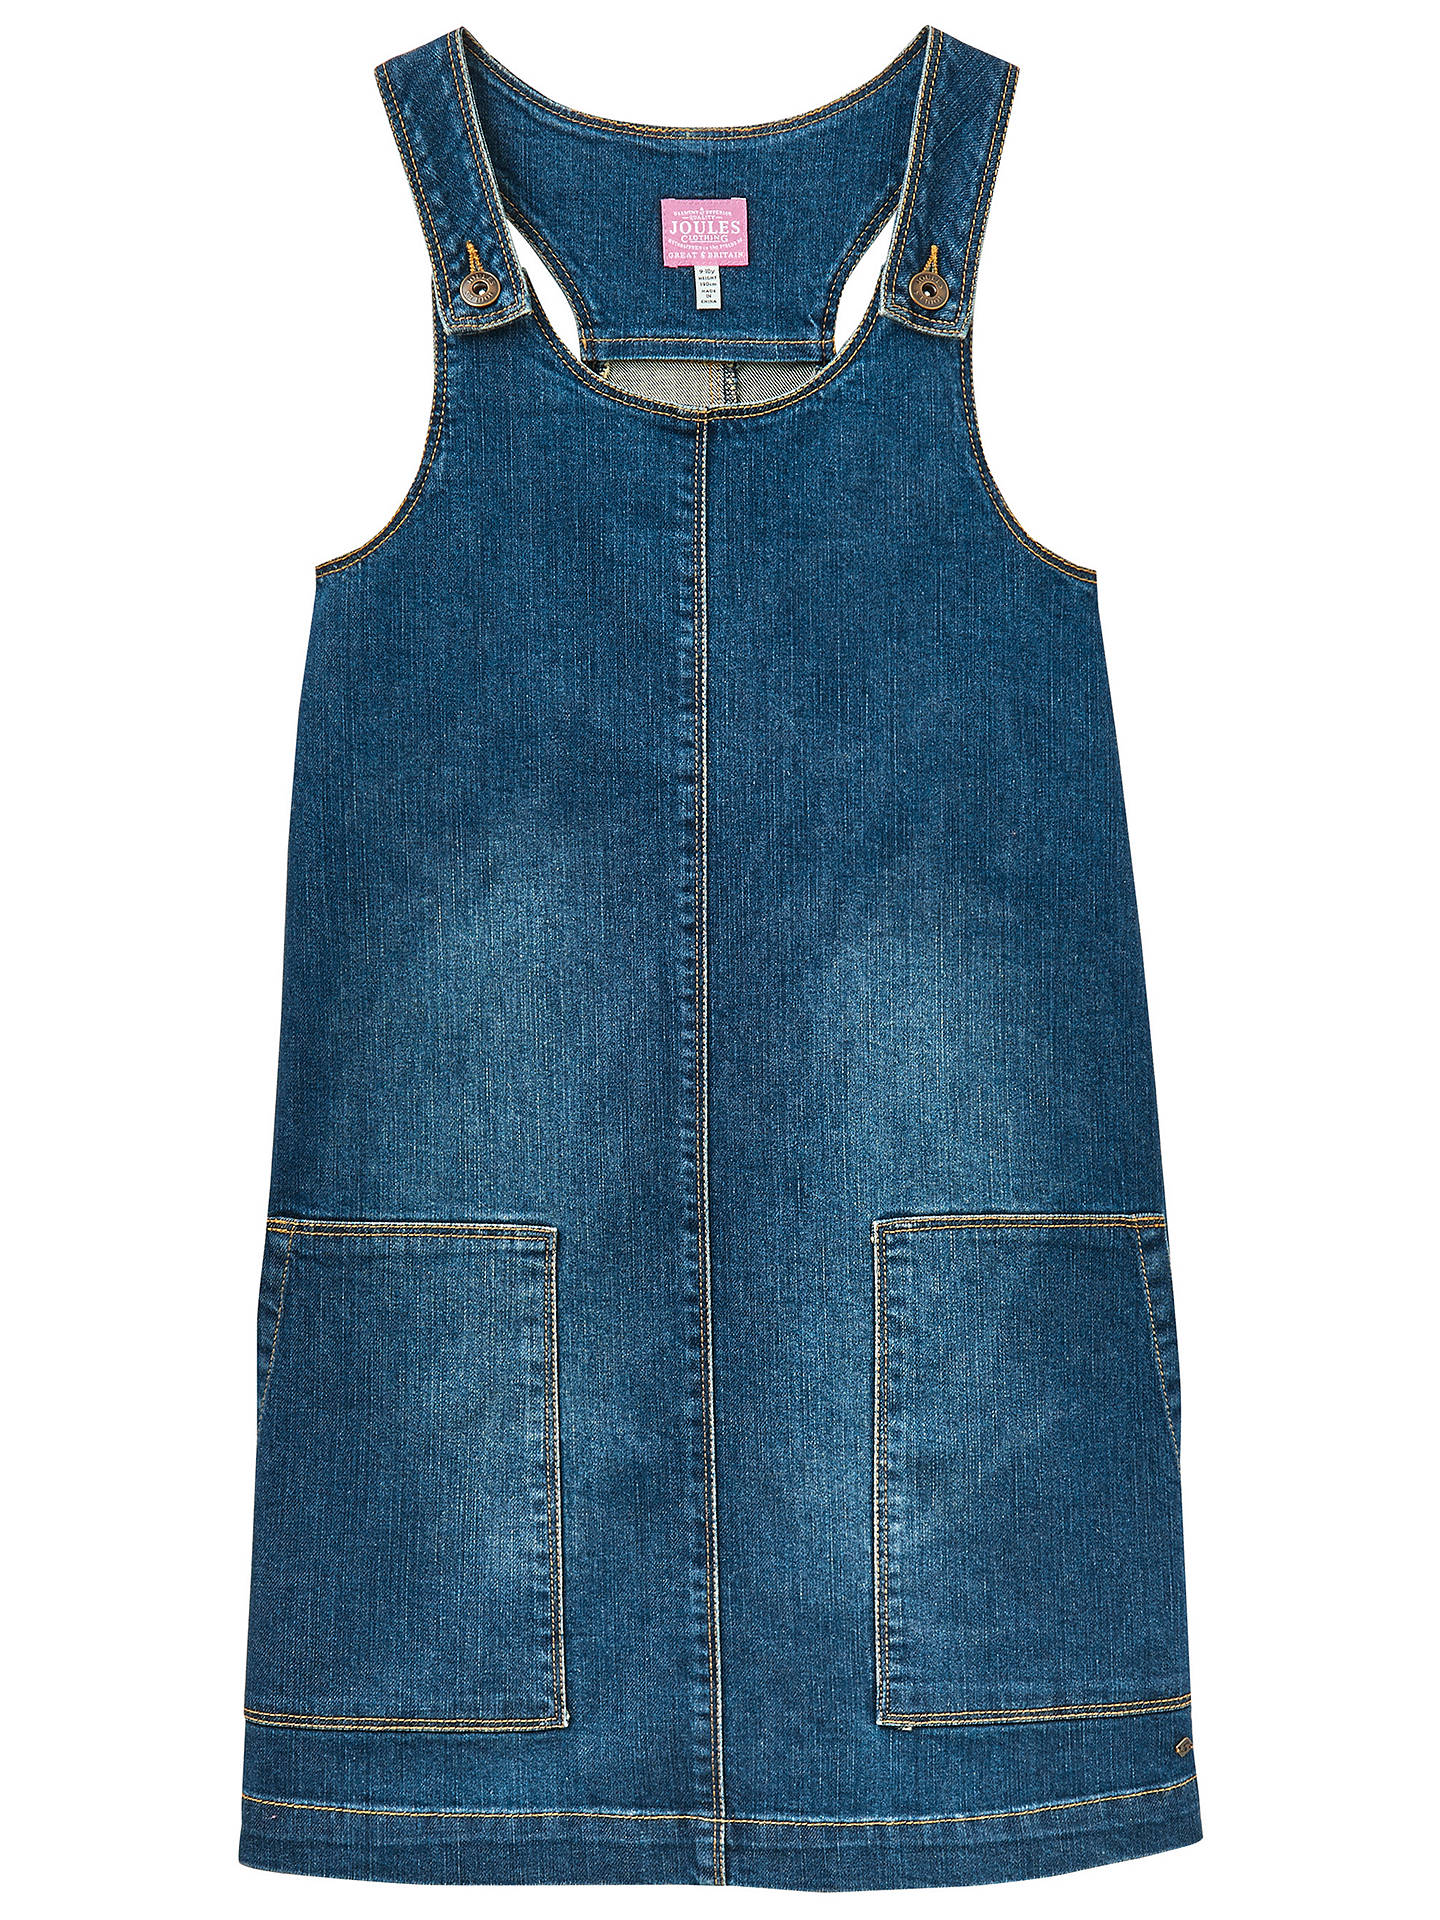 fd24c5fd4773 Buy Little Joule Girls' Denim Pinafore Dress, Blue, 3 years Online at  johnlewis ...